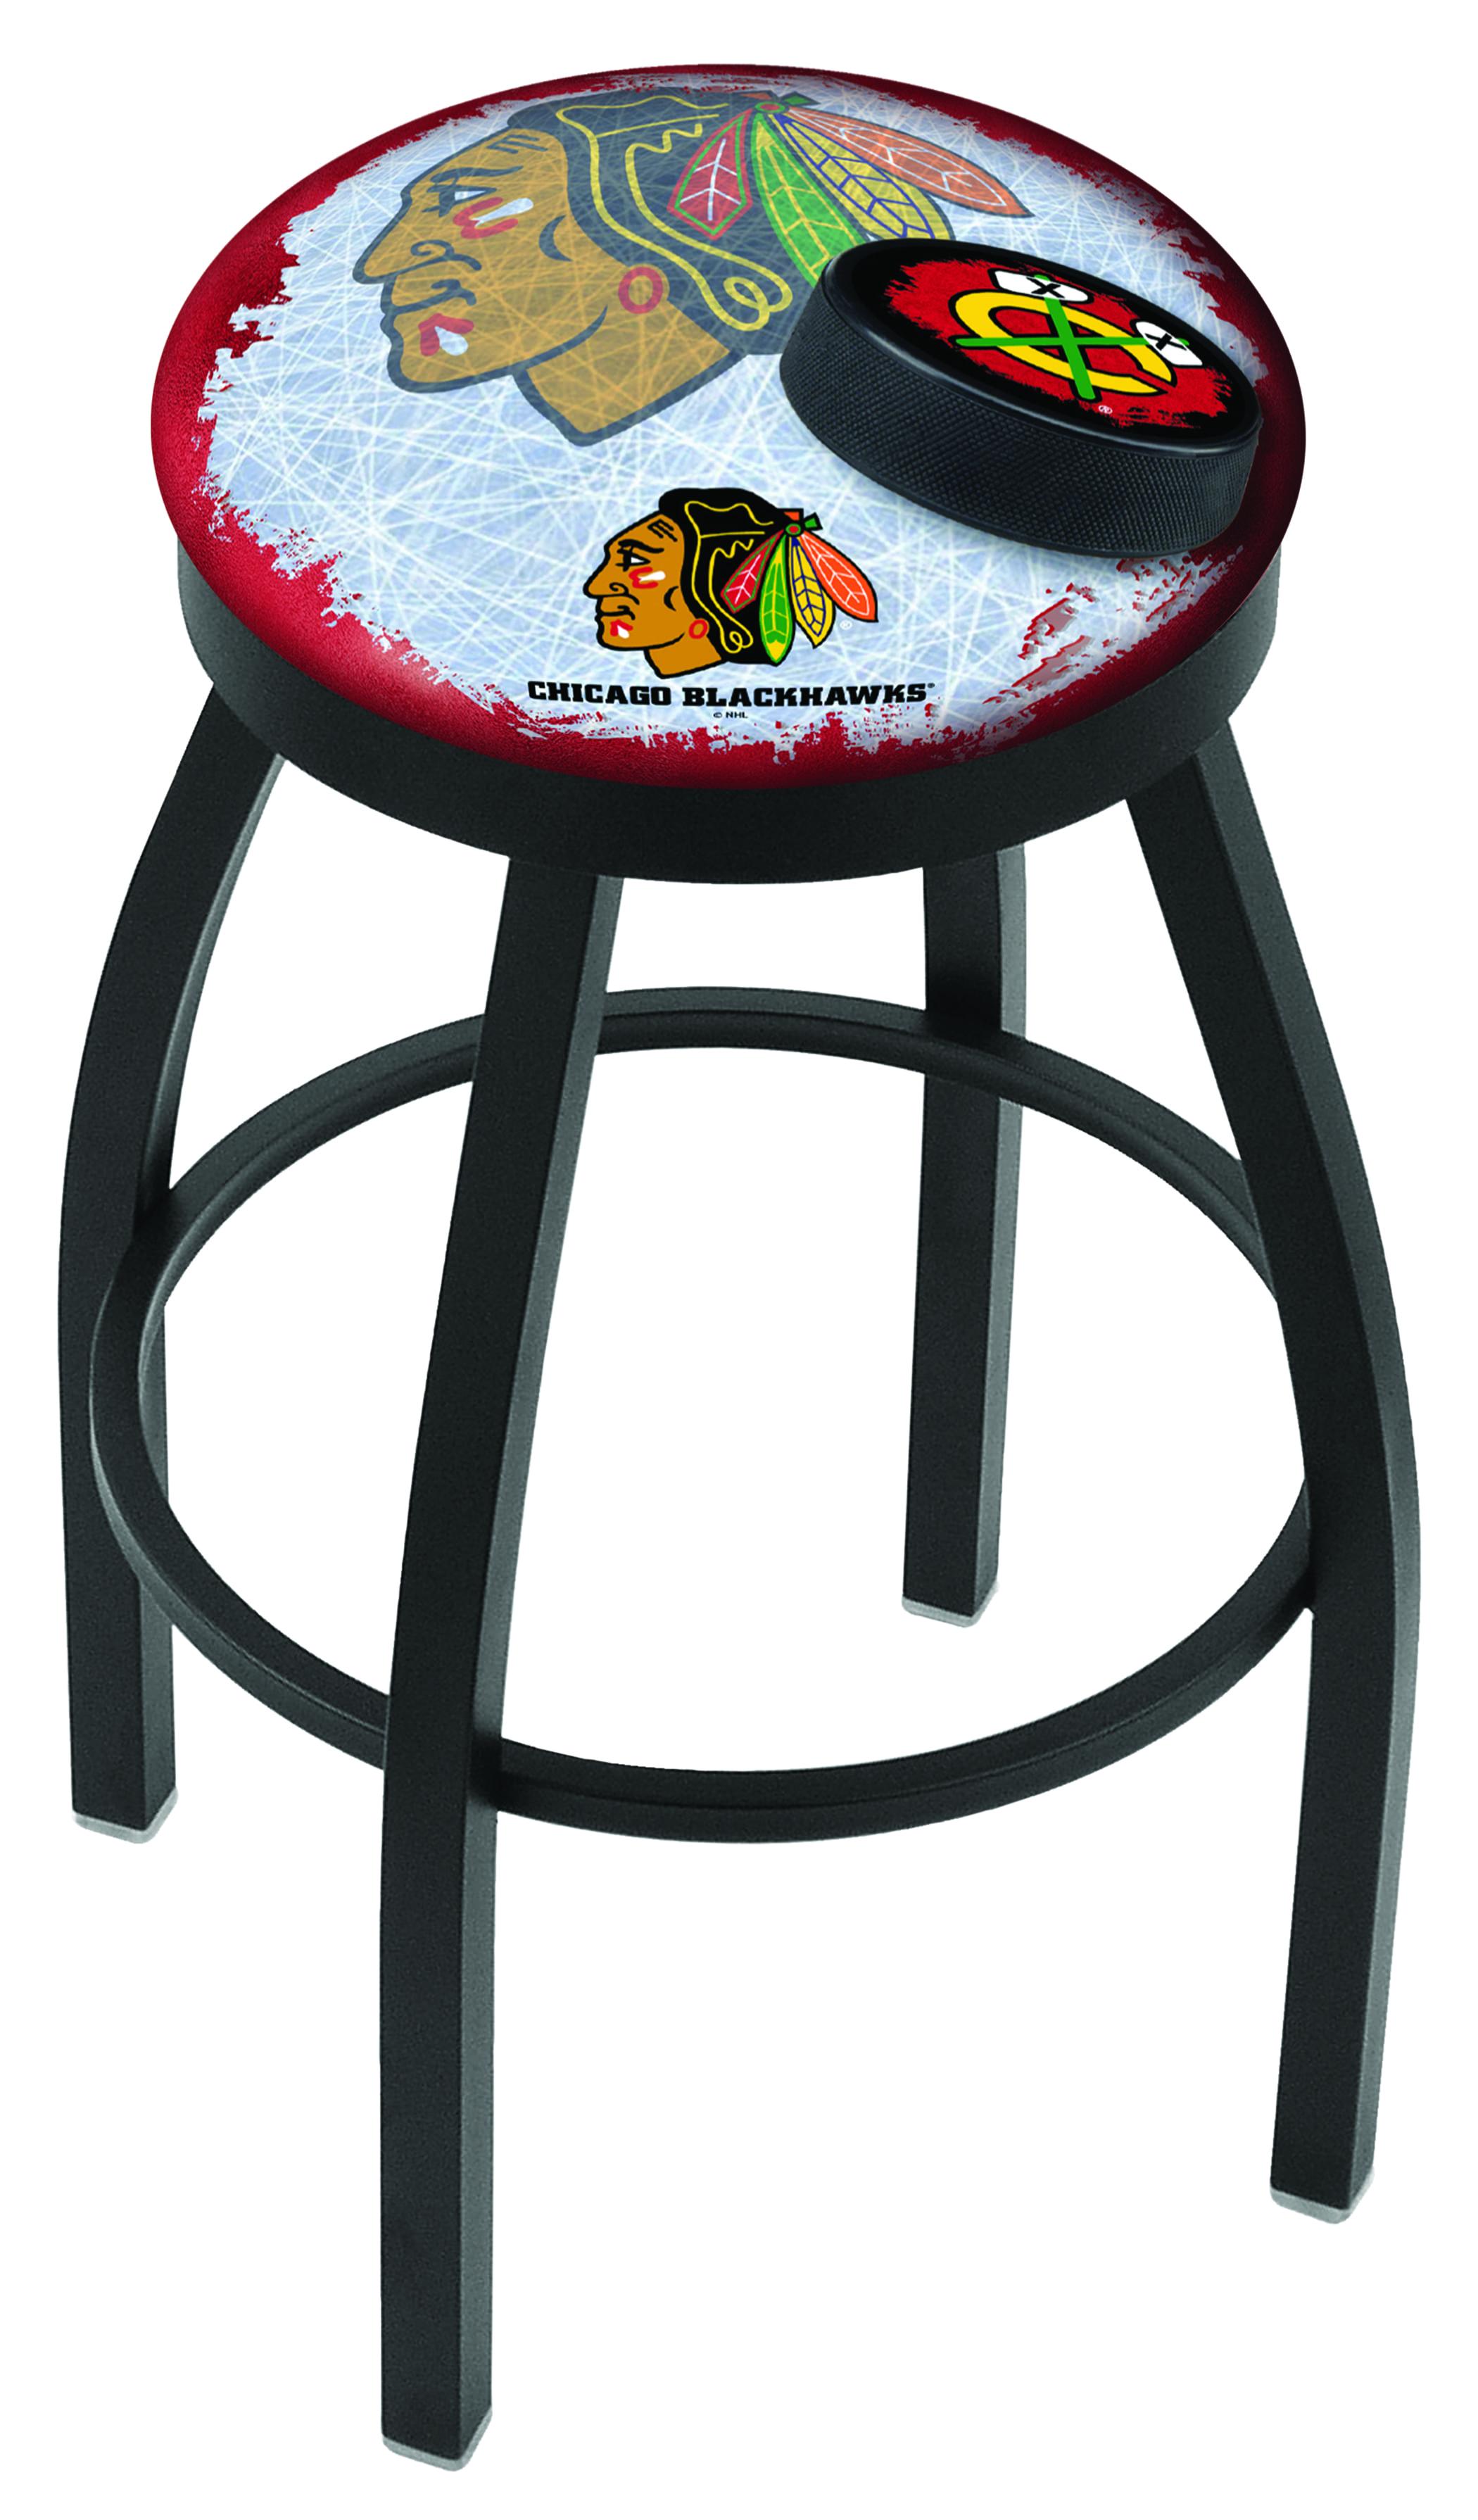 Enjoyable Chicago Blackhawks Spectator Chair W Red Background W Lamtechconsult Wood Chair Design Ideas Lamtechconsultcom